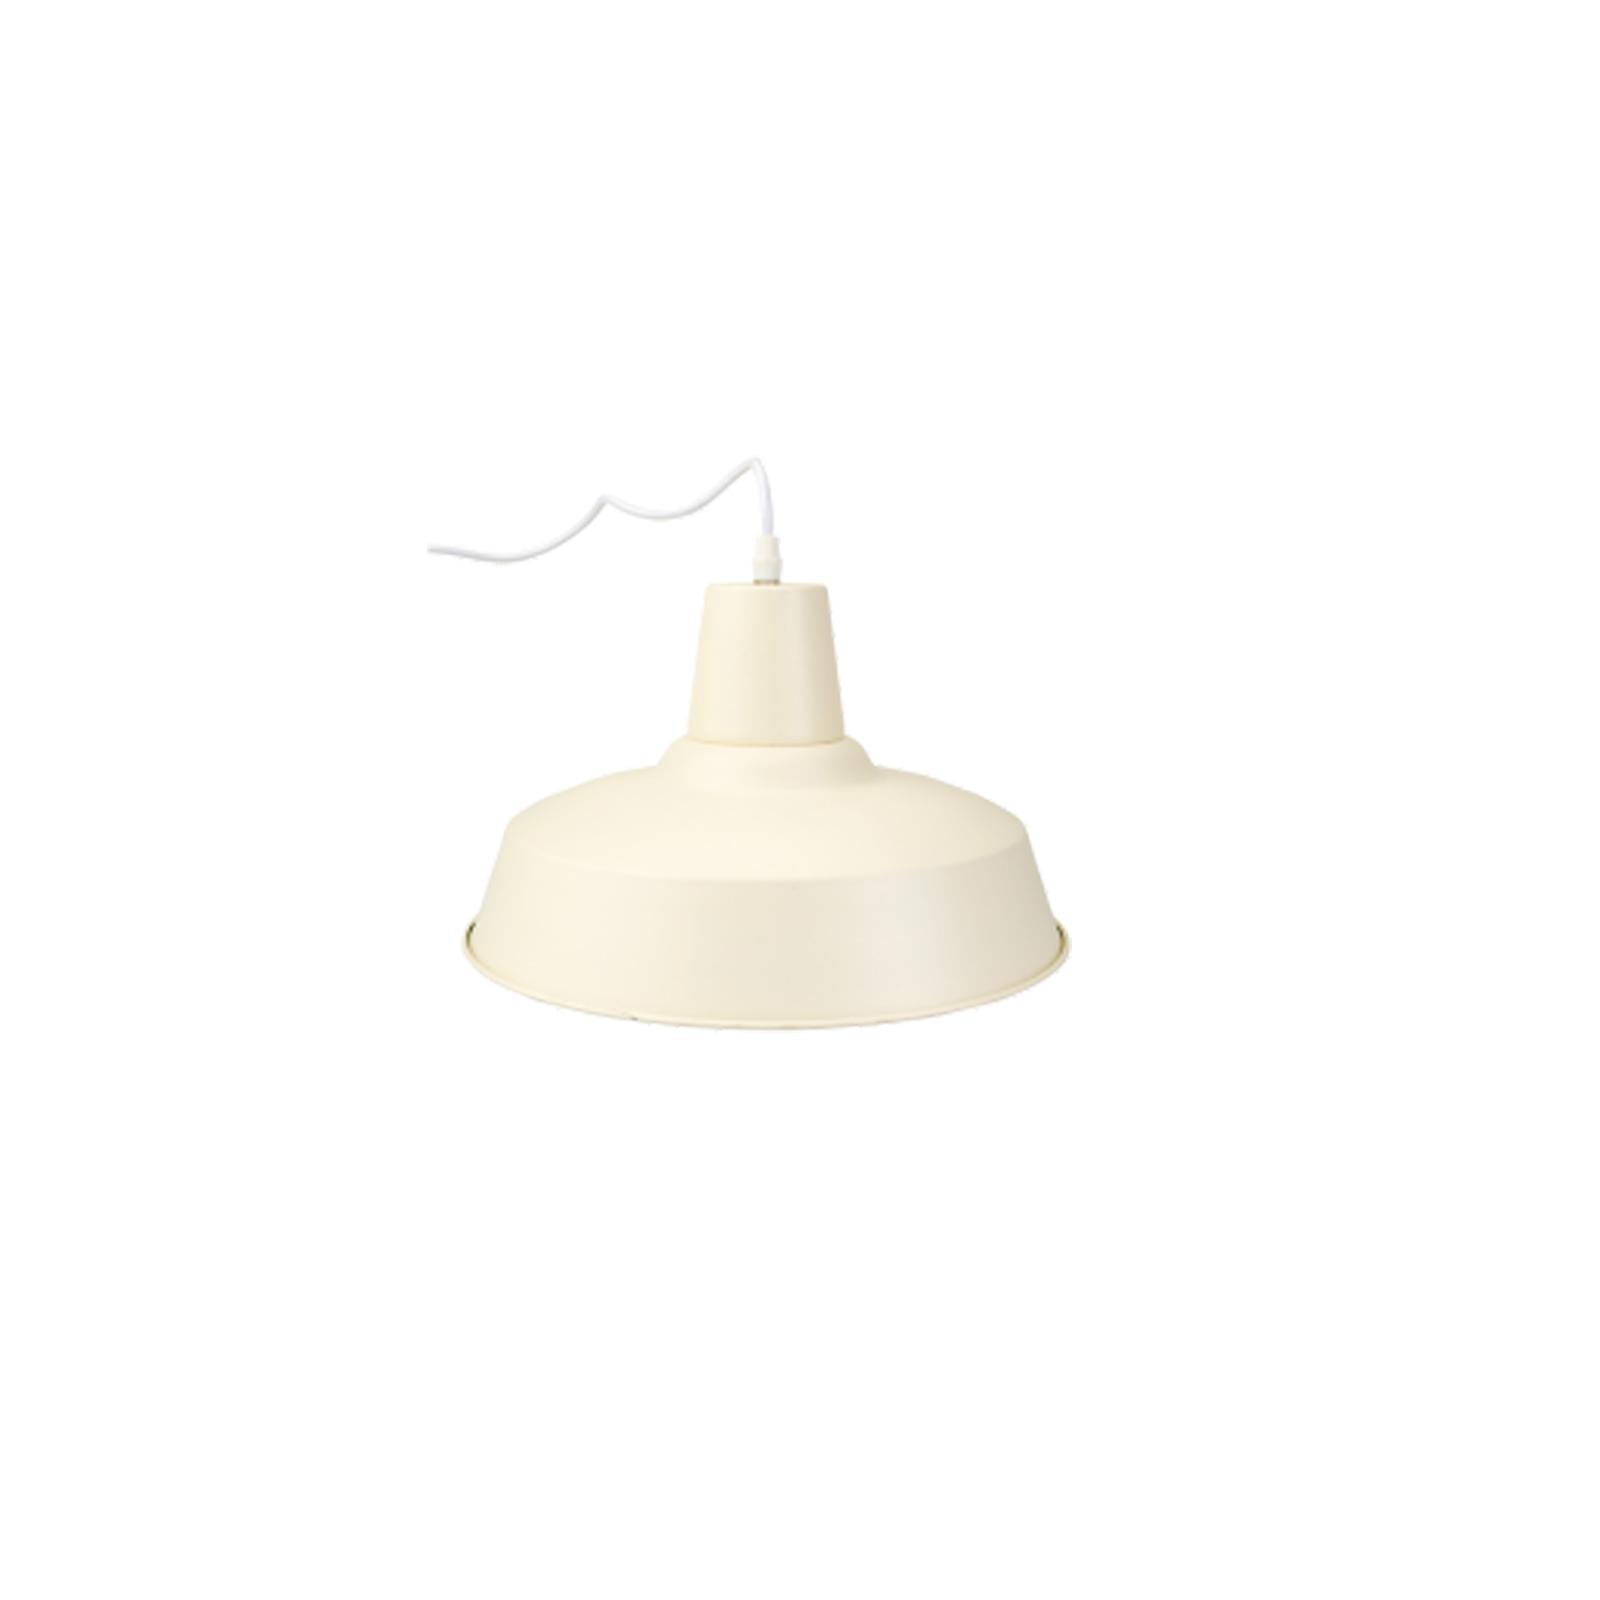 2 couleurs lampe industrielle suspendue conception pendentif lumi re ebay - Lampe industrielle ikea ...